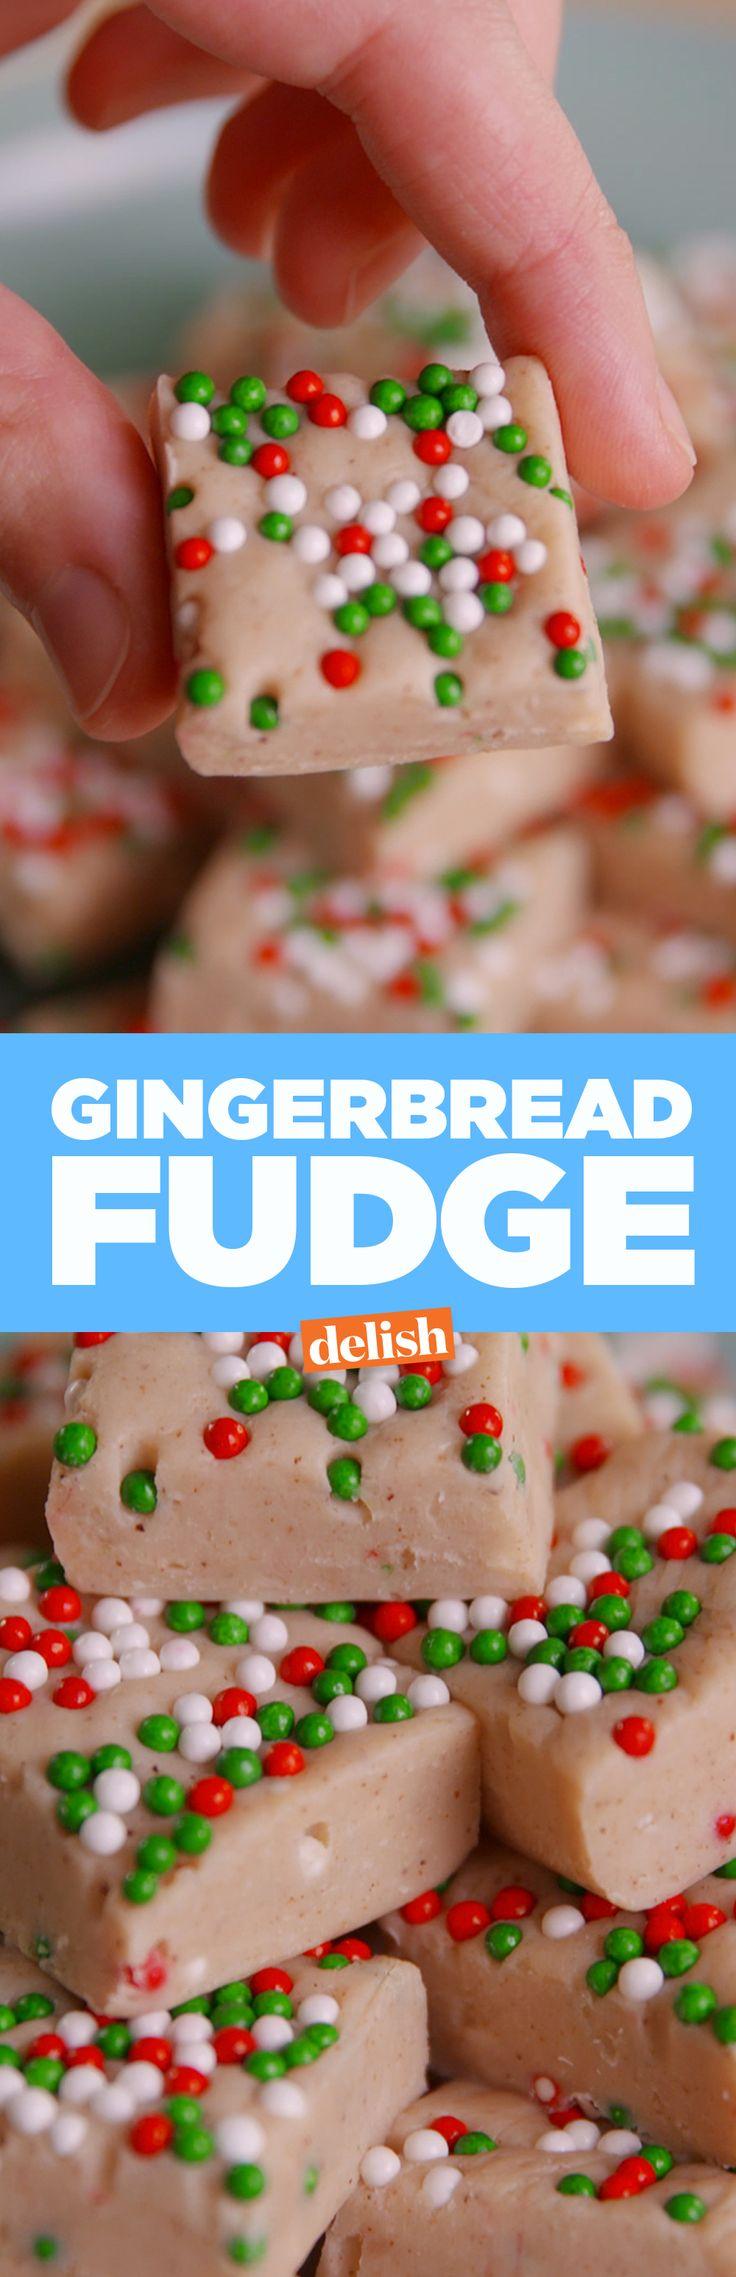 This gingerbread fudge tastes like Christmas. Get the recipe on Delish.com.